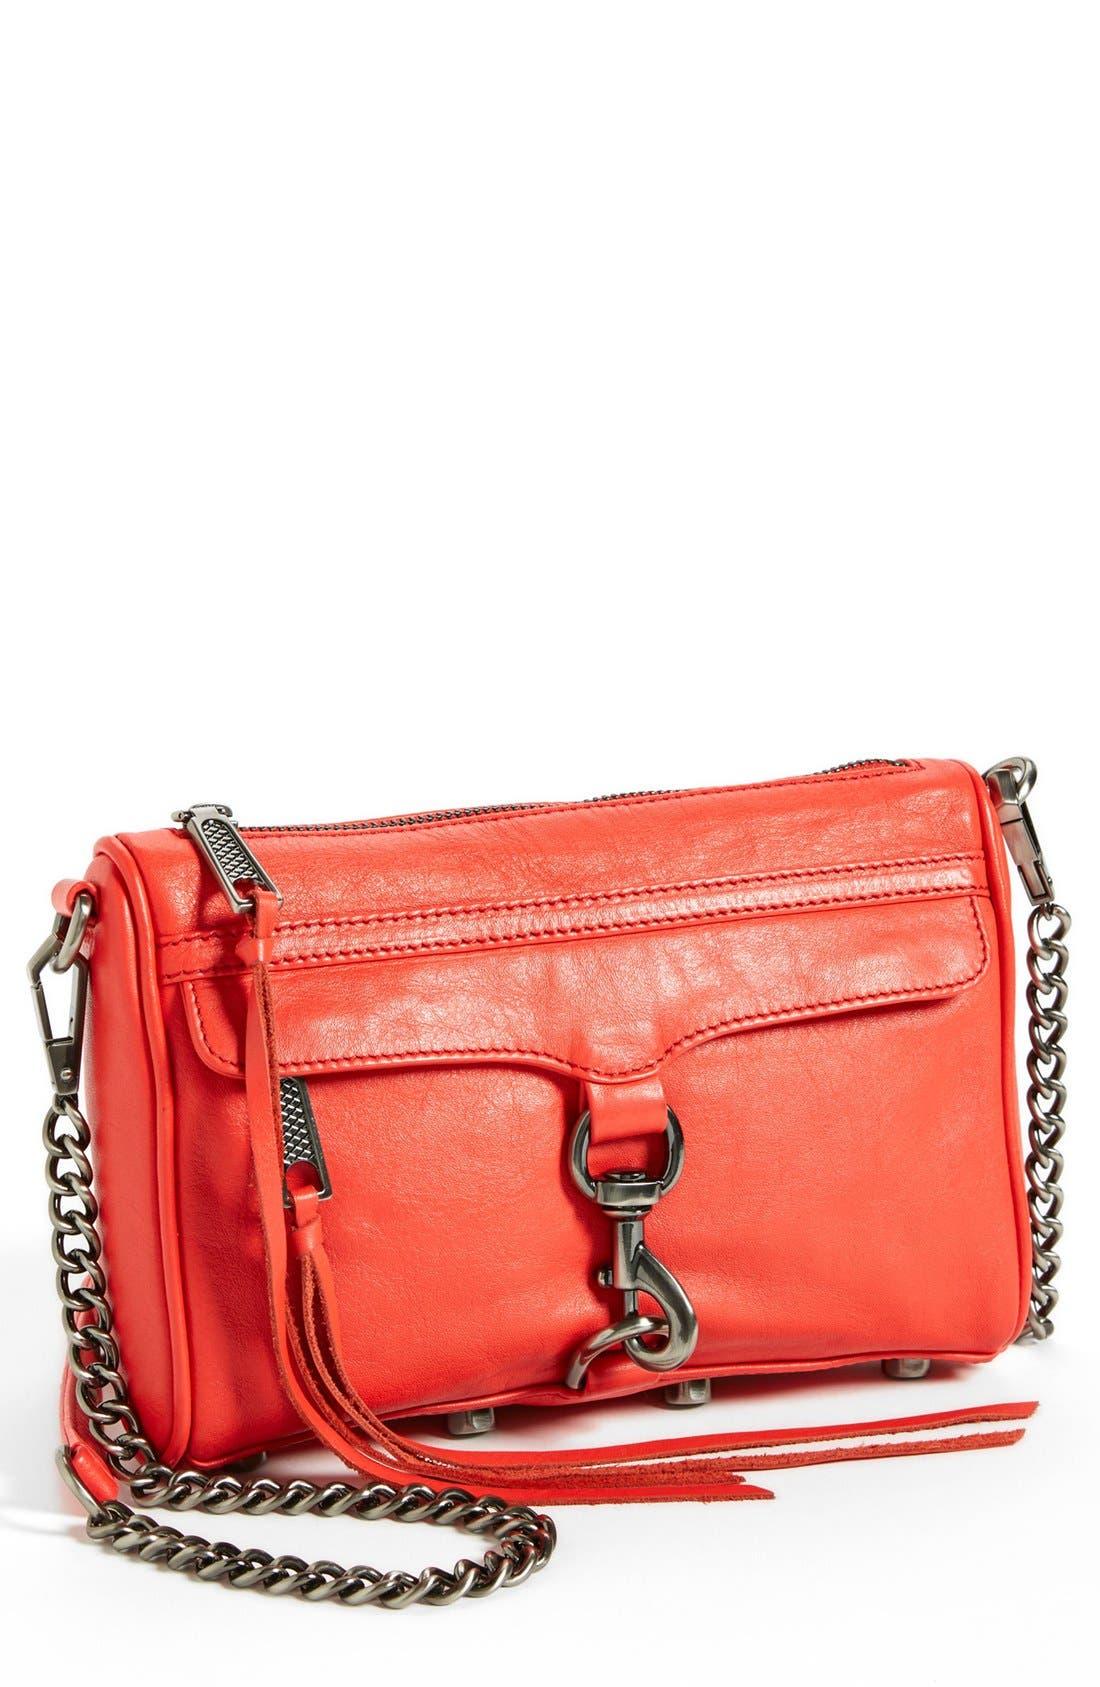 Main Image - Rebecca Minkoff 'Mini MAC' Leather Crossbody Clutch